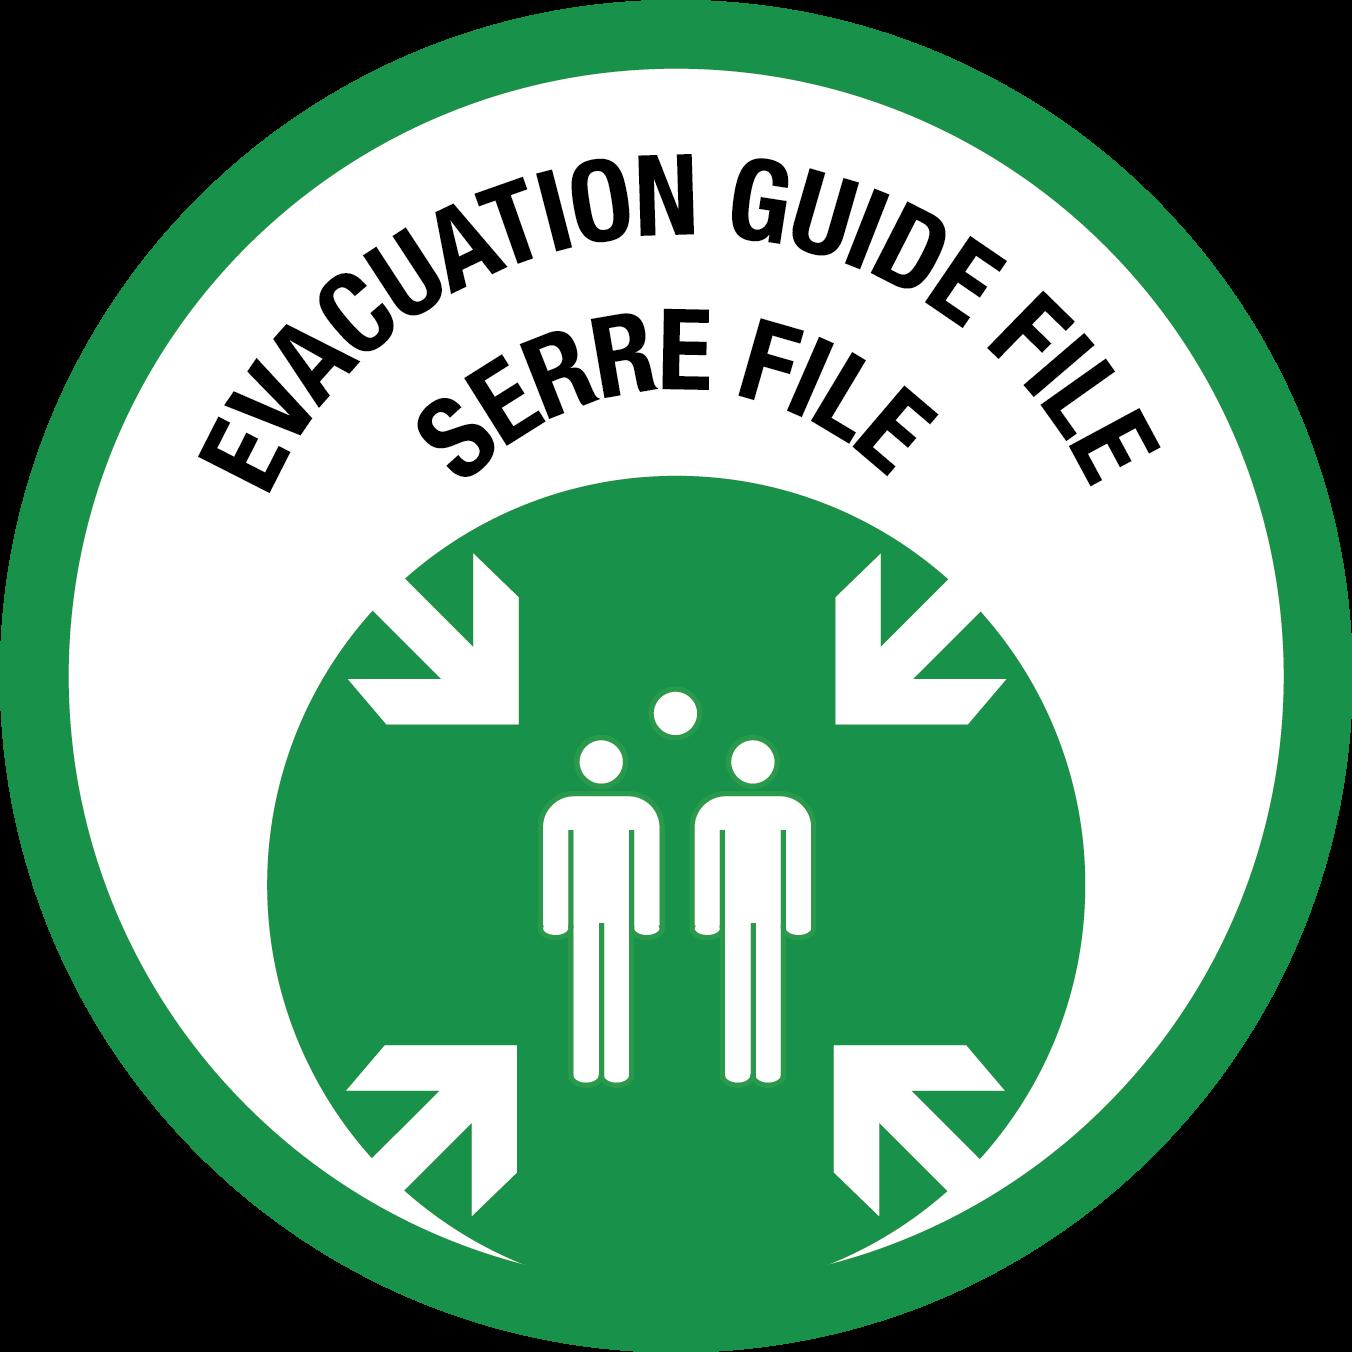 Logo formation evacuation guide file serre file